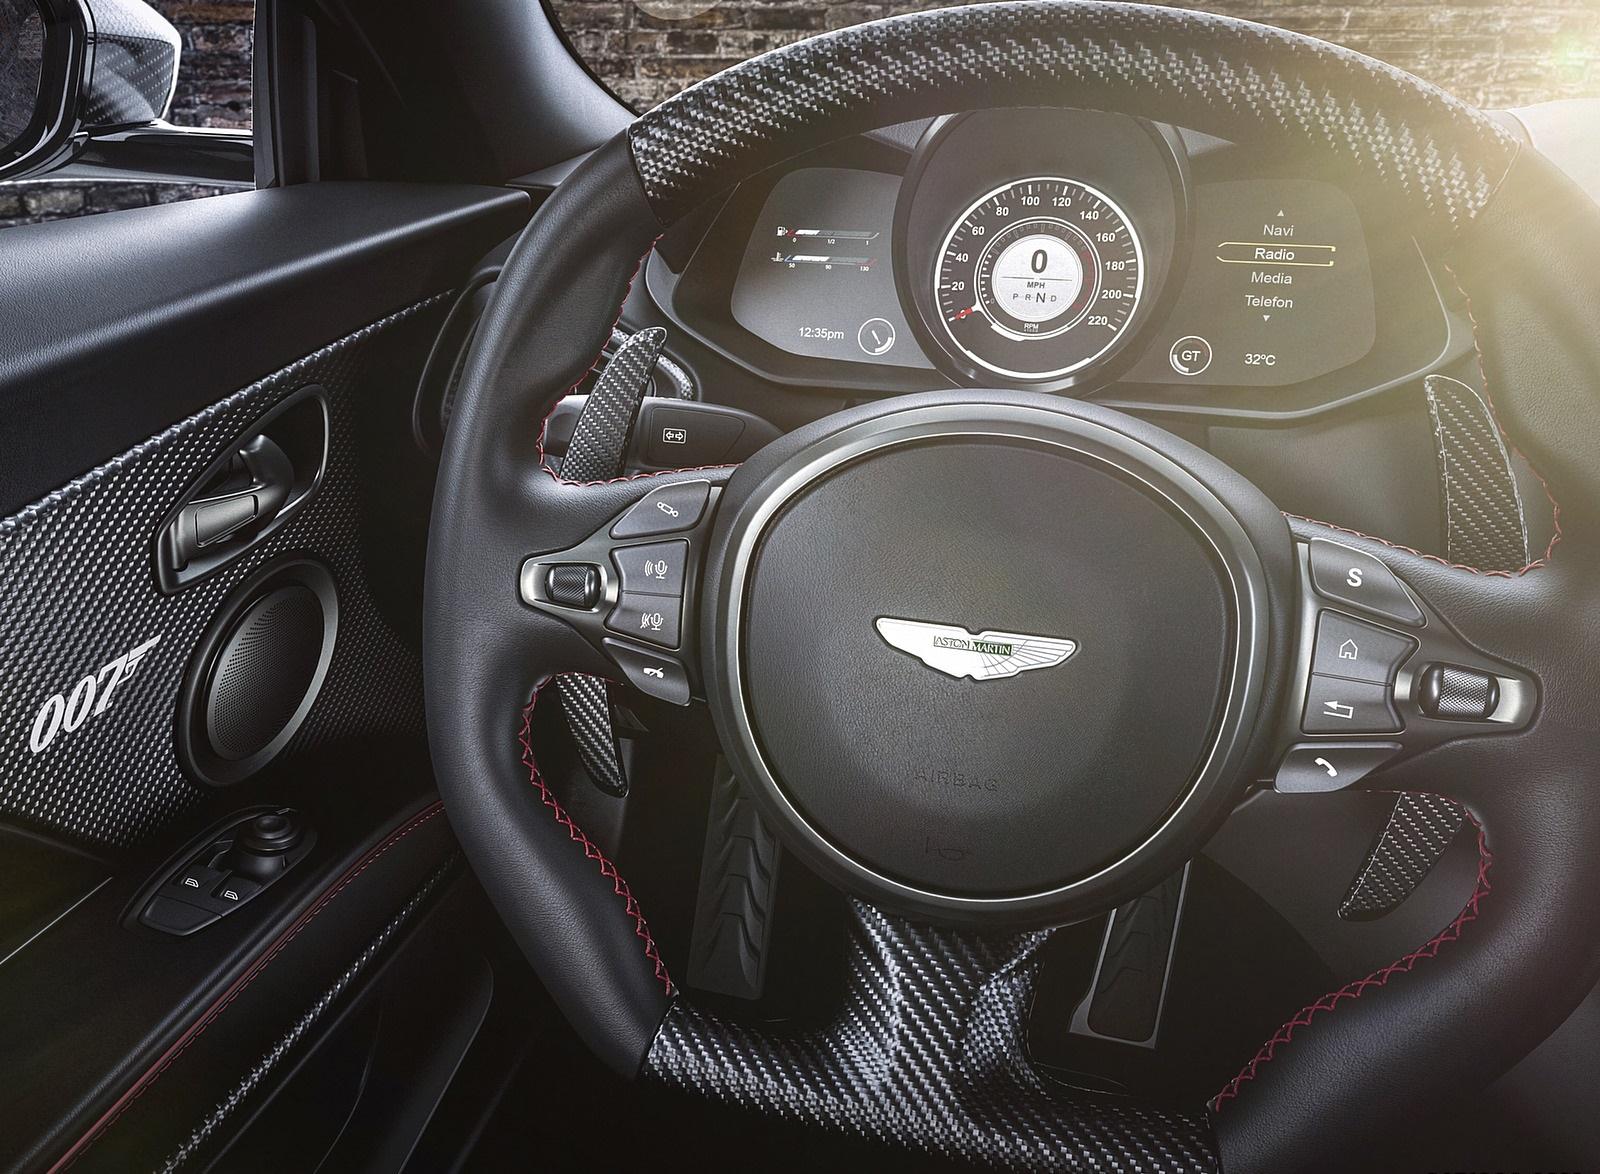 2021 Aston Martin DBS Superleggera 007 Edition Interior Steering Wheel Wallpapers (8)